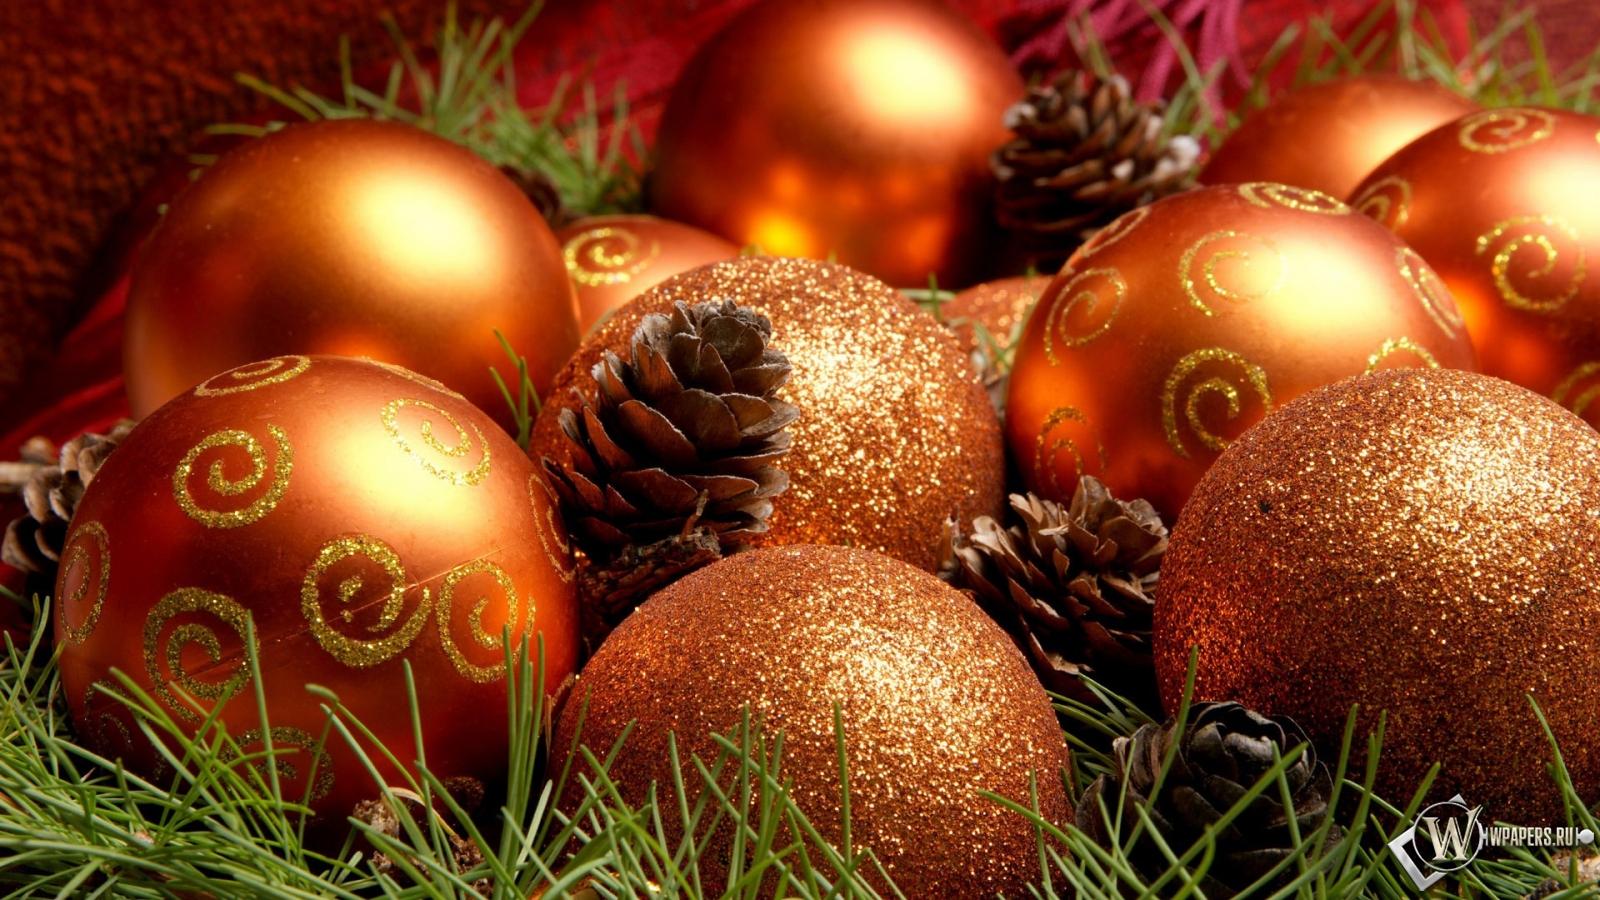 Рождественские шарики 1600x900